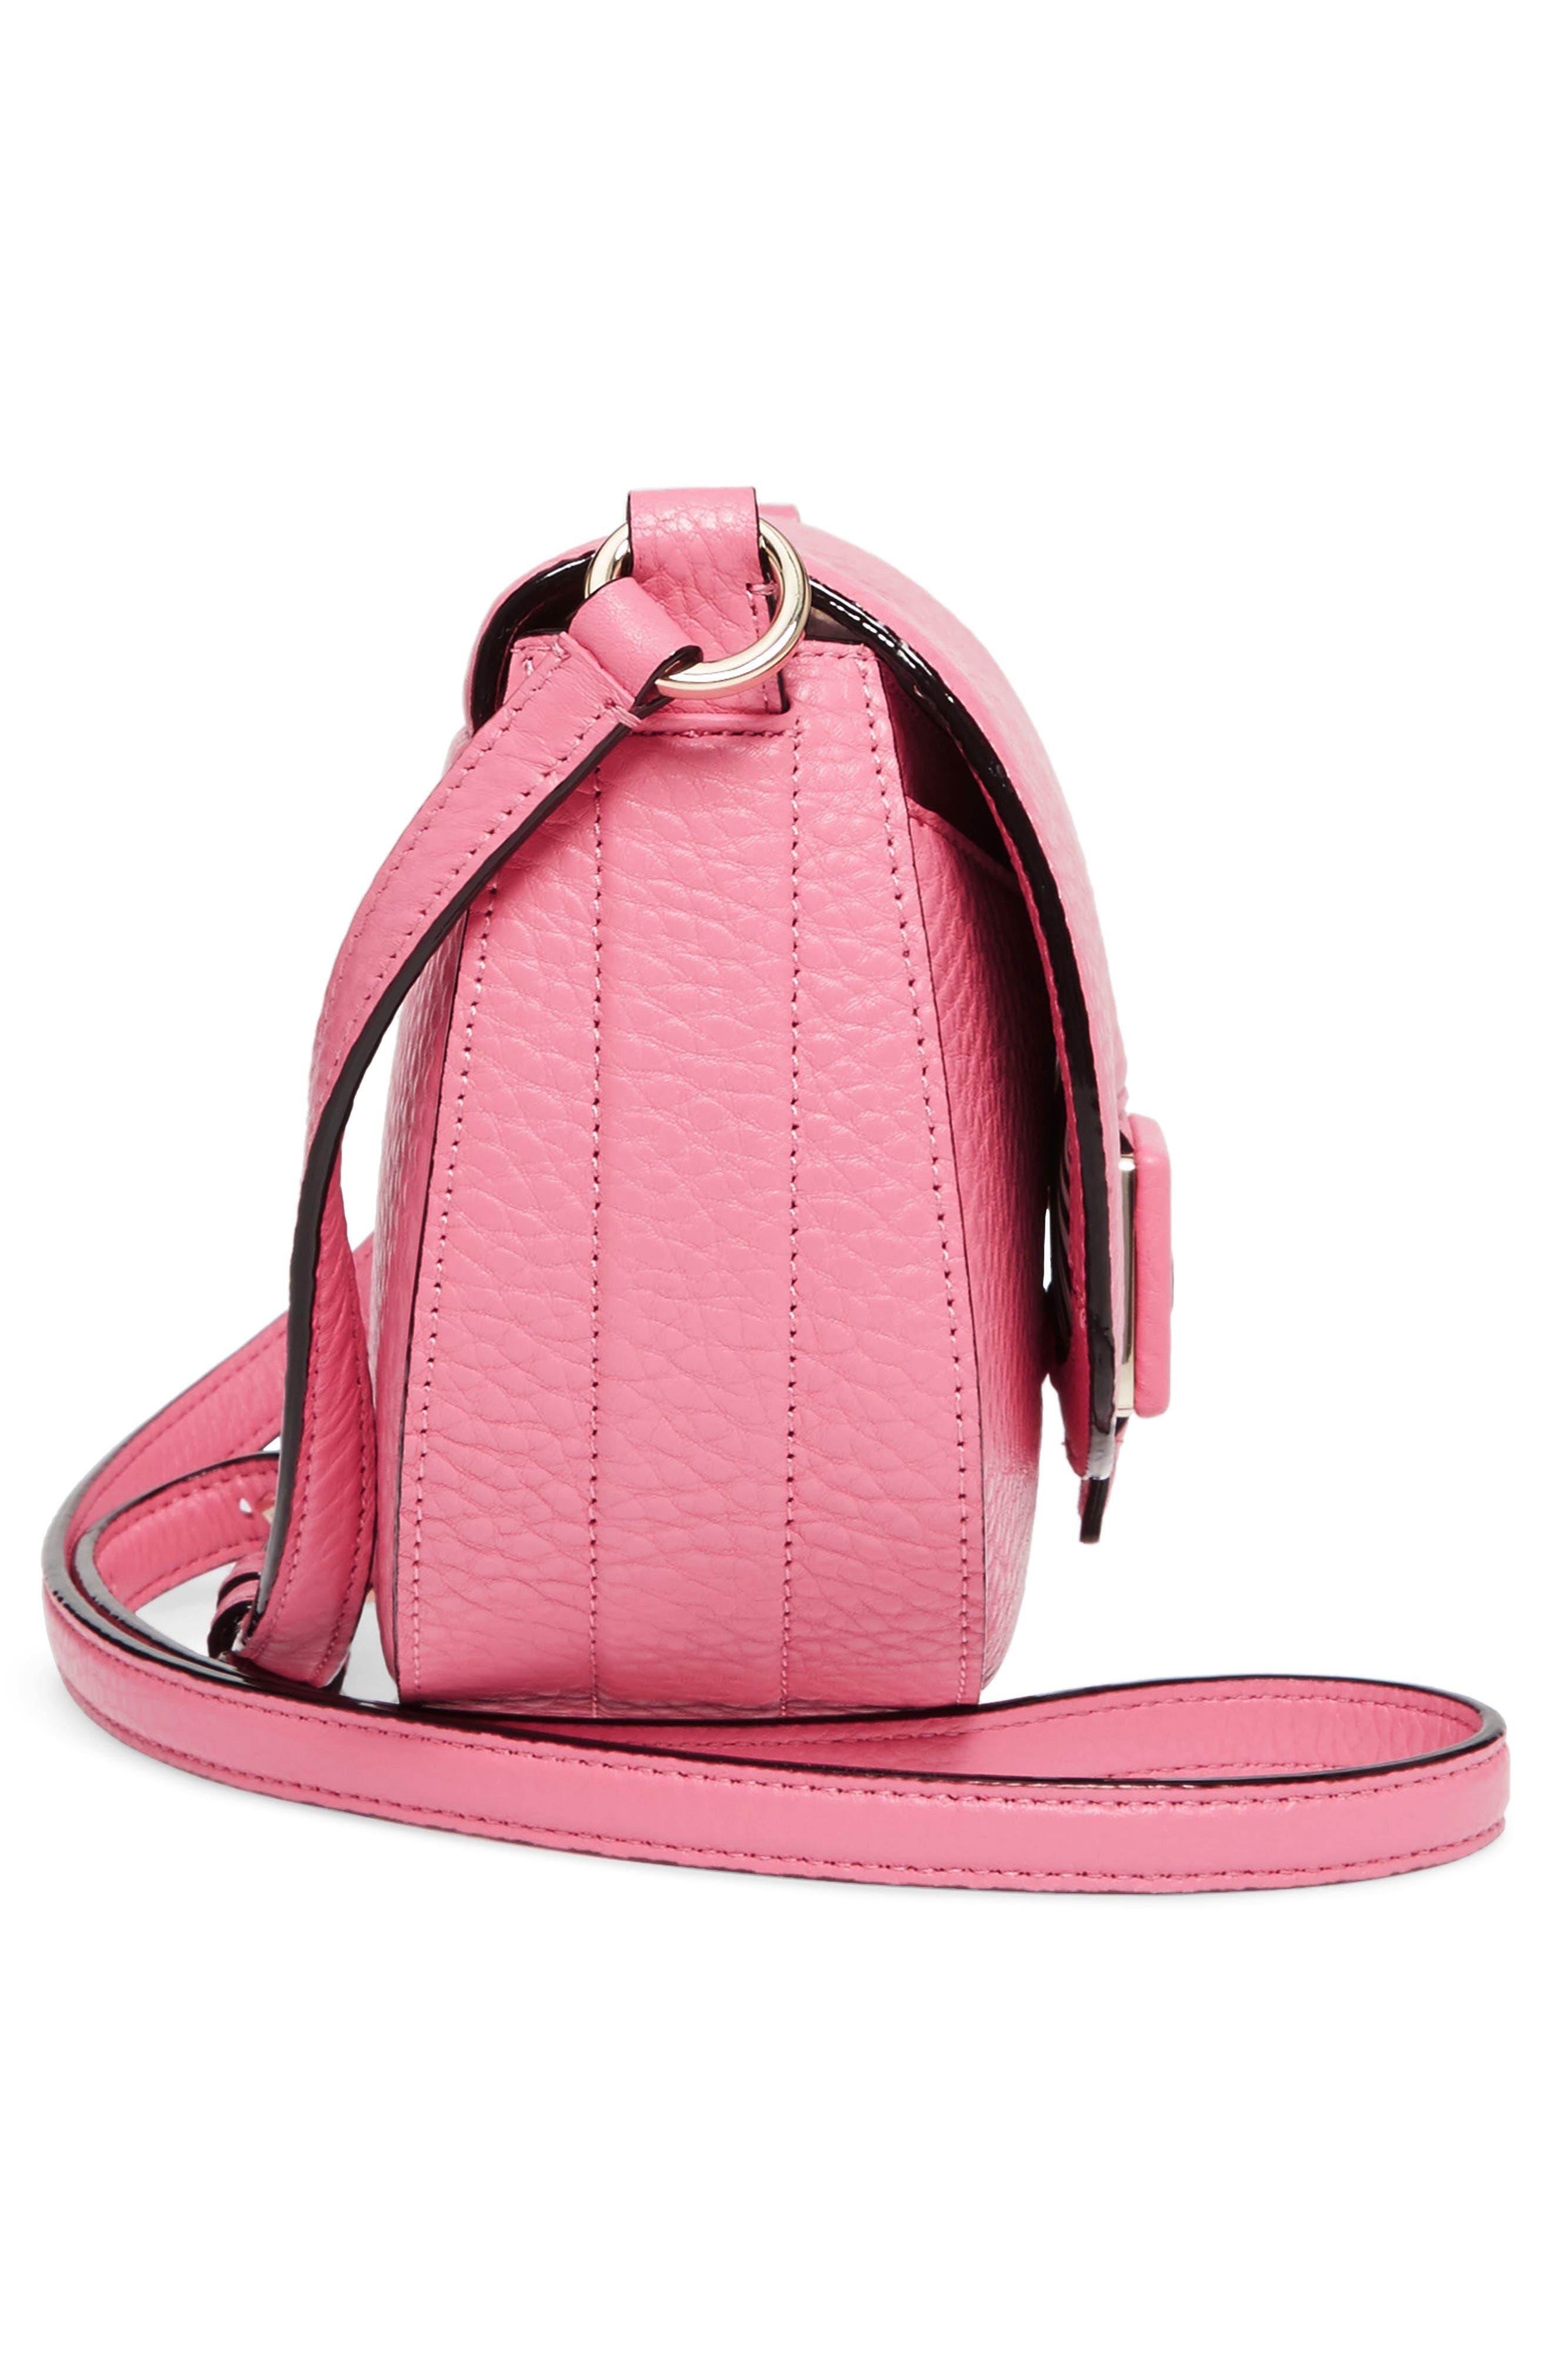 carlyle street - kallie leather saddle bag,                             Alternate thumbnail 5, color,                             Pink Sunset